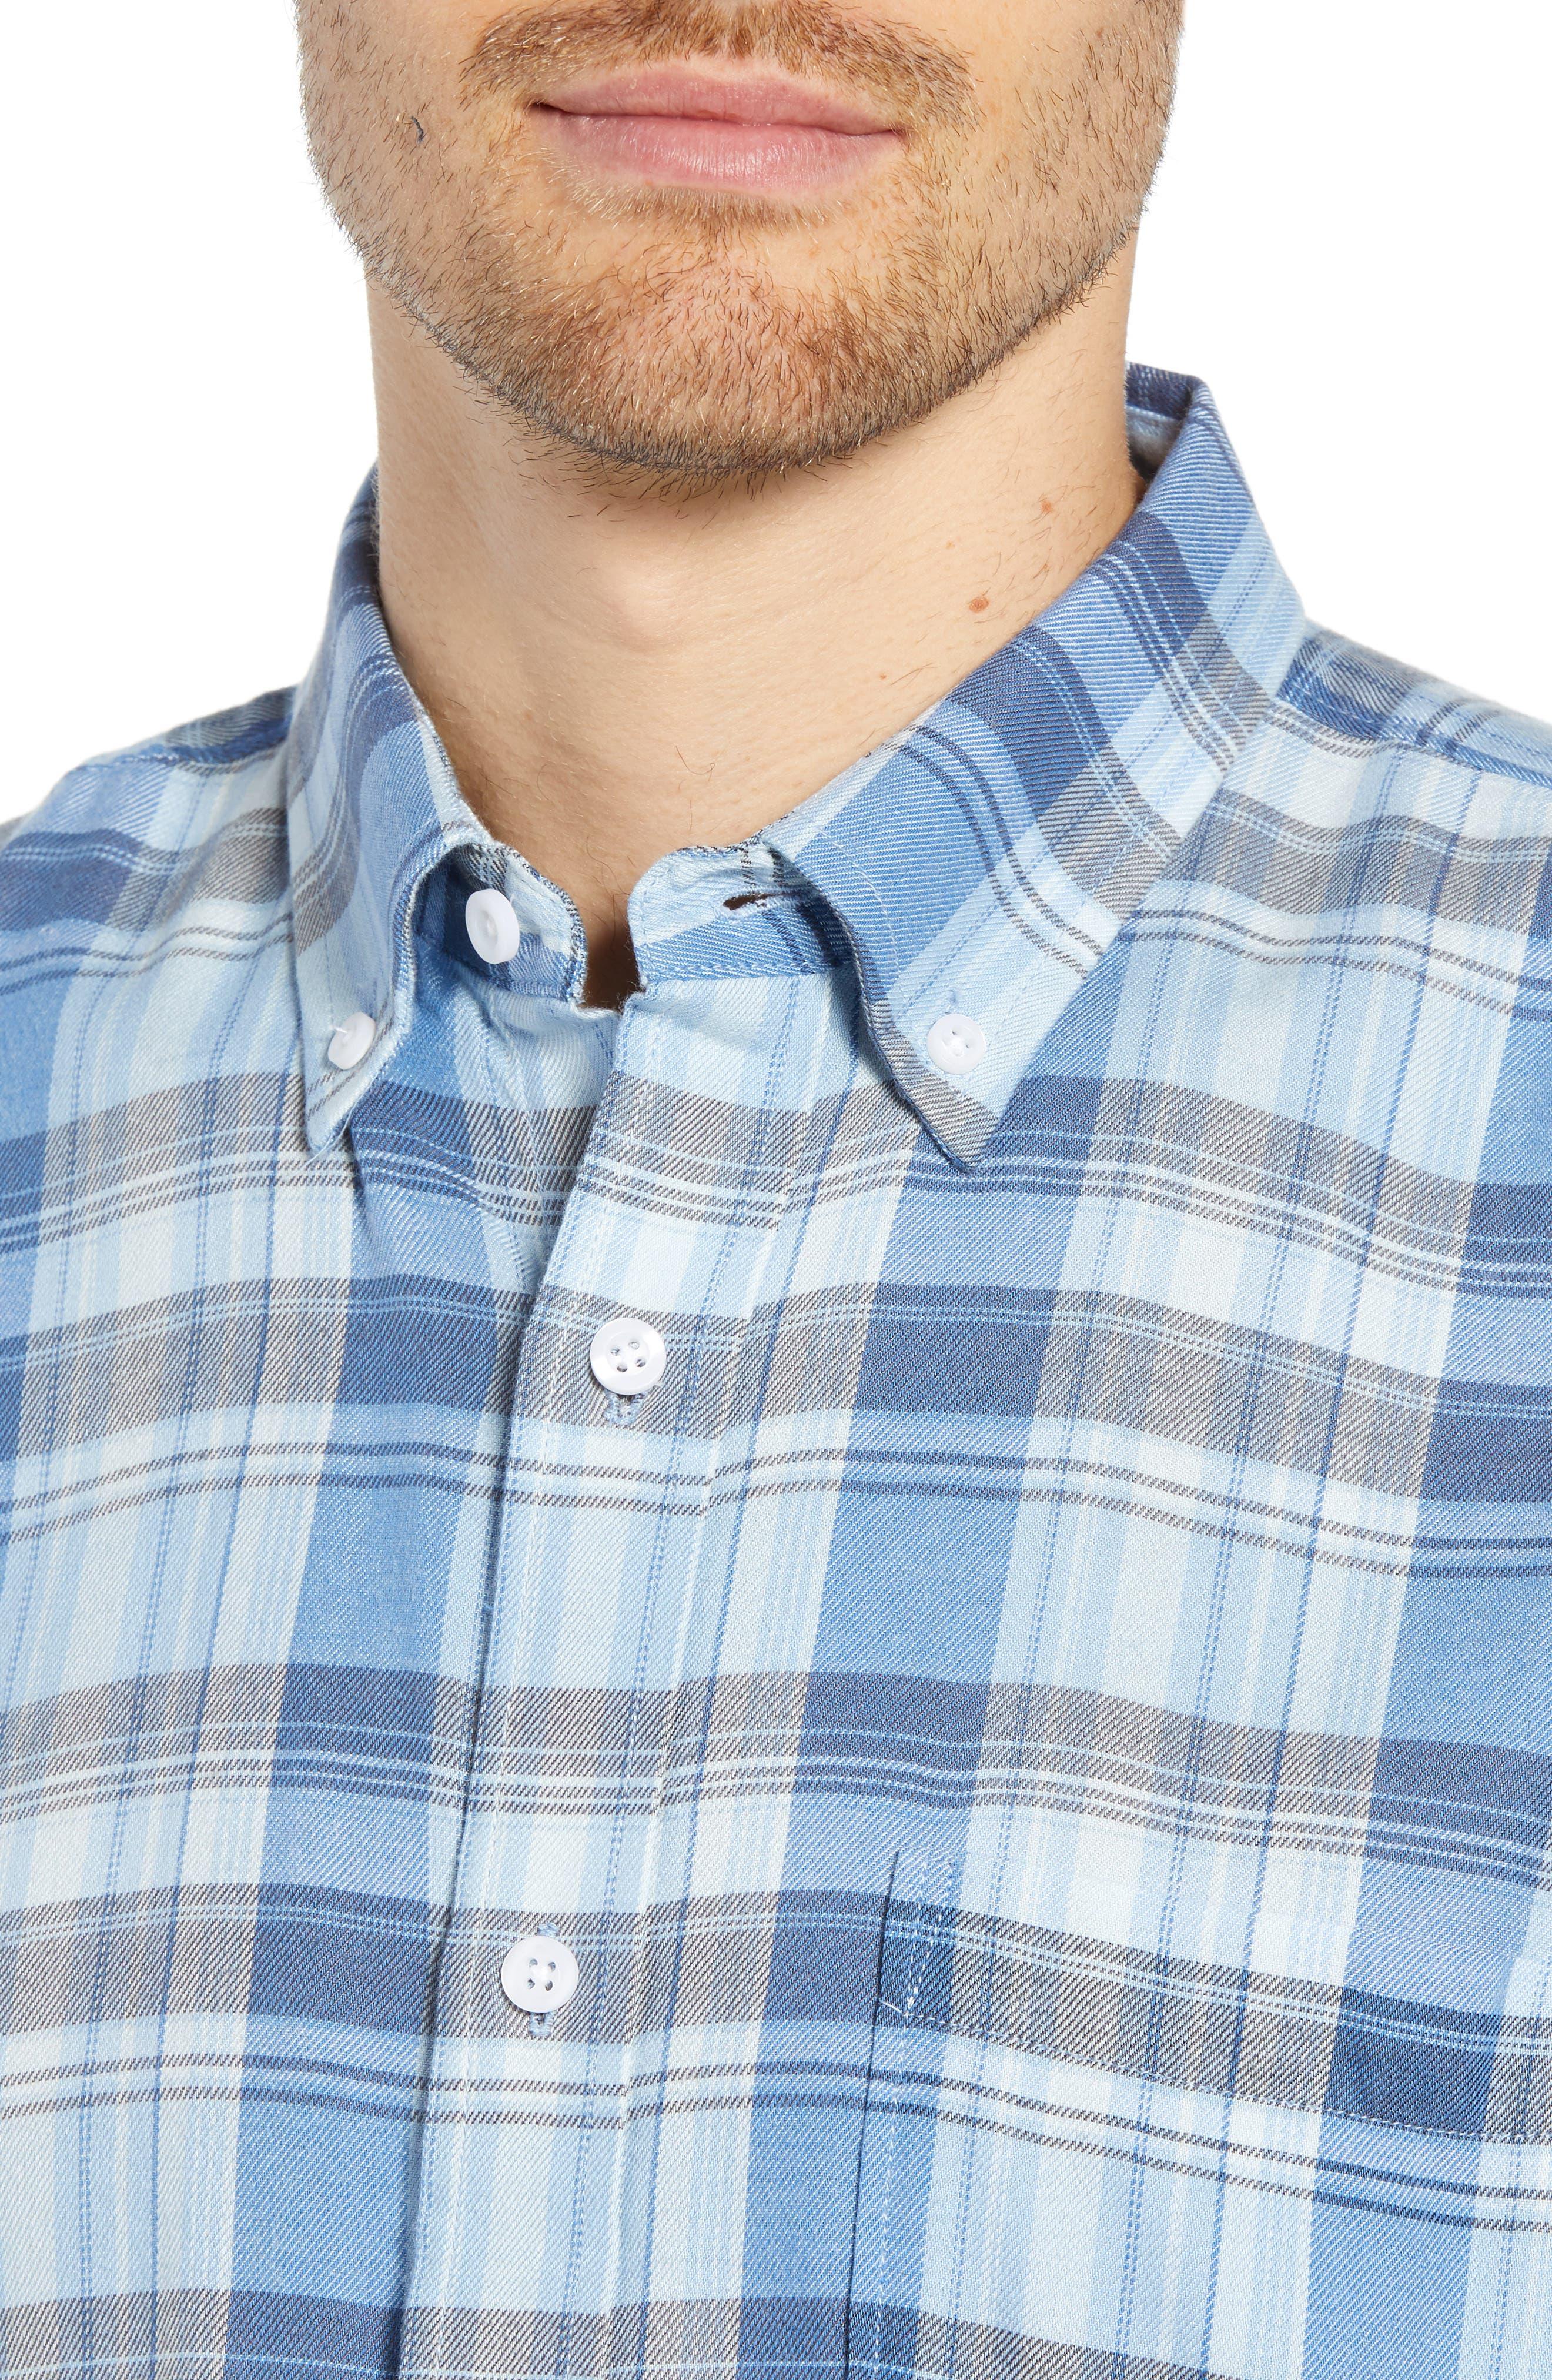 Slim Fit Plaid Sport Shirt,                             Alternate thumbnail 2, color,                             BLUE CHAMBRAY BLUE DARK PLAID